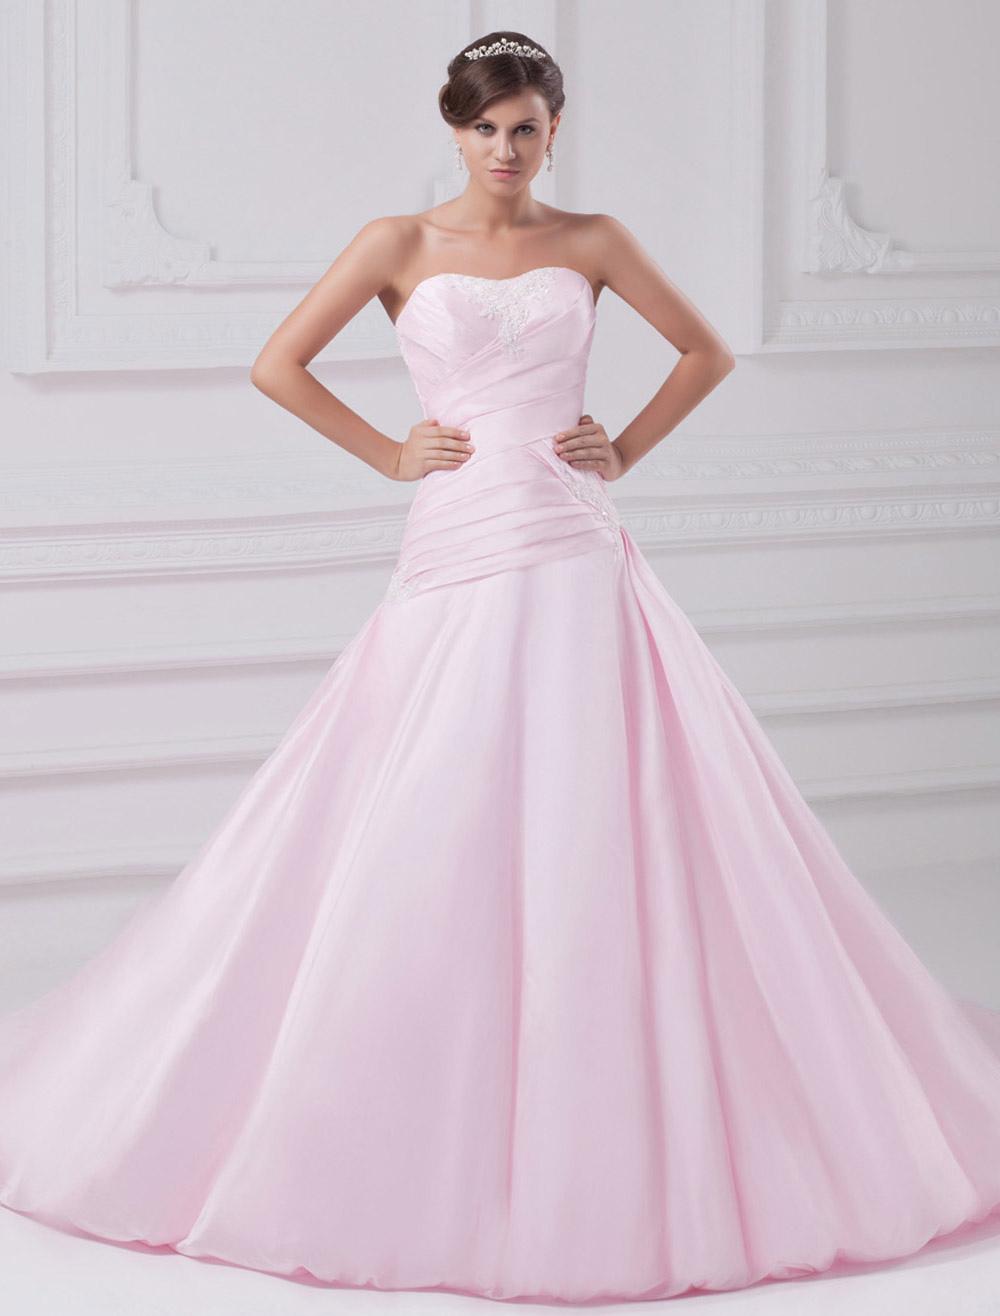 A-line Sweetheart Neck Strapless Ruched Taffeta Pink Wedding Dress